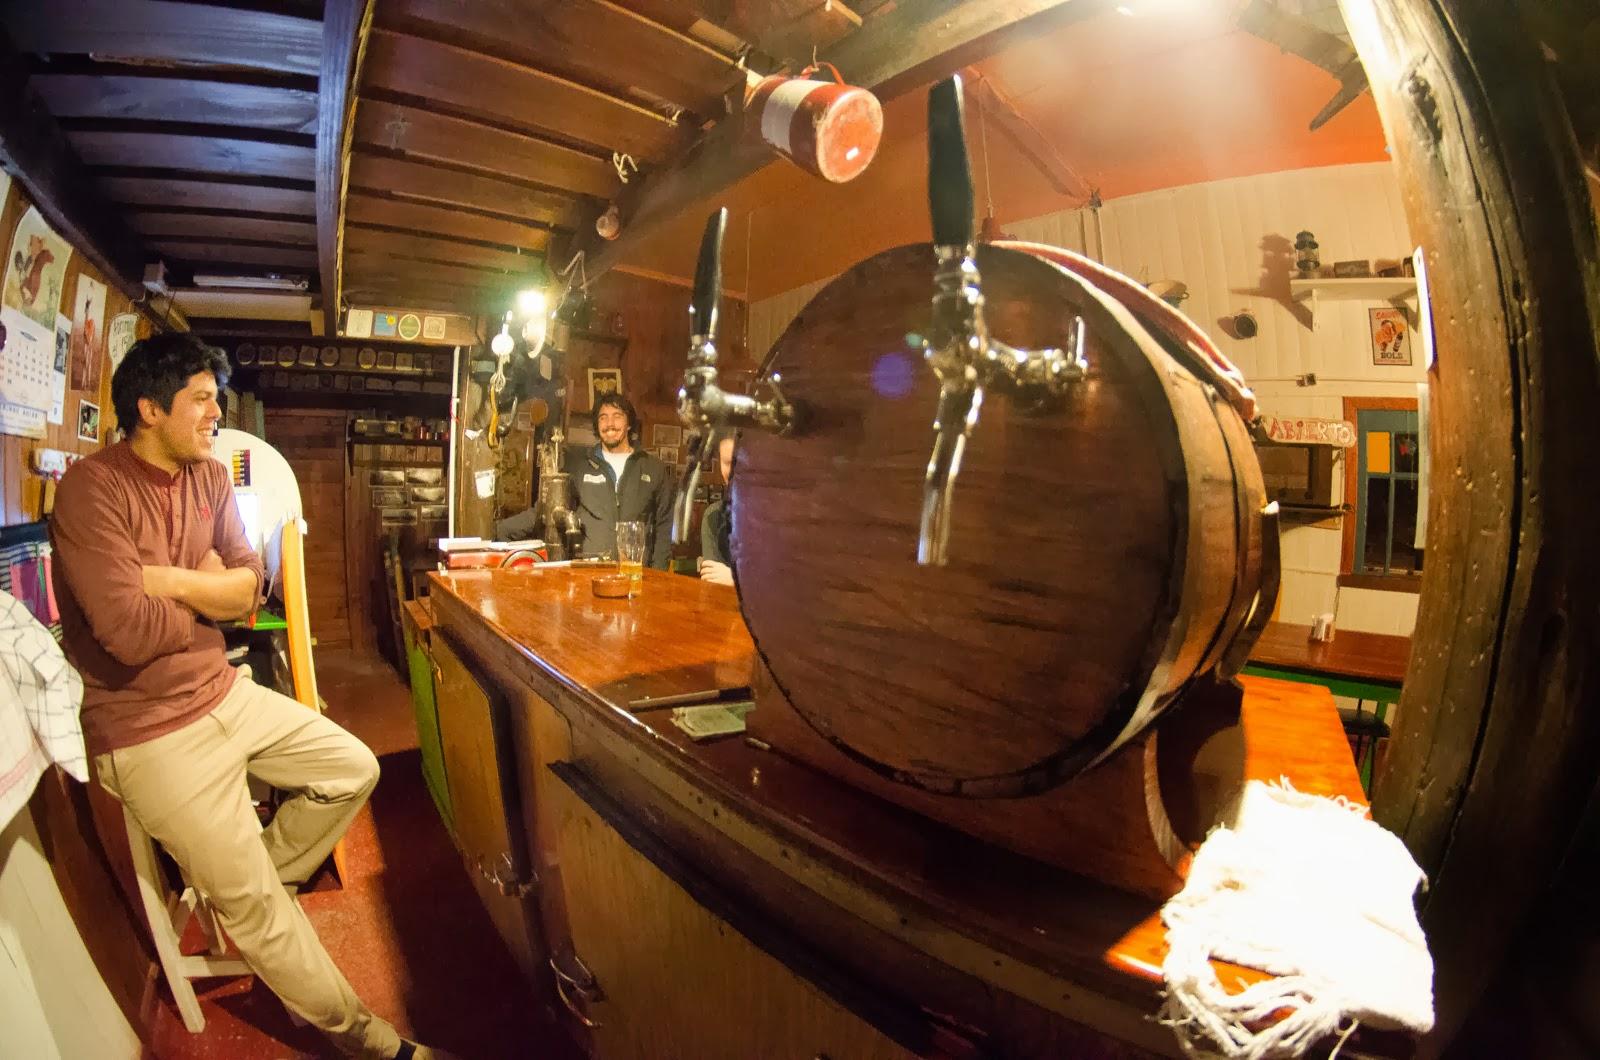 Las choperas listas para servir unas cervezas tiradas